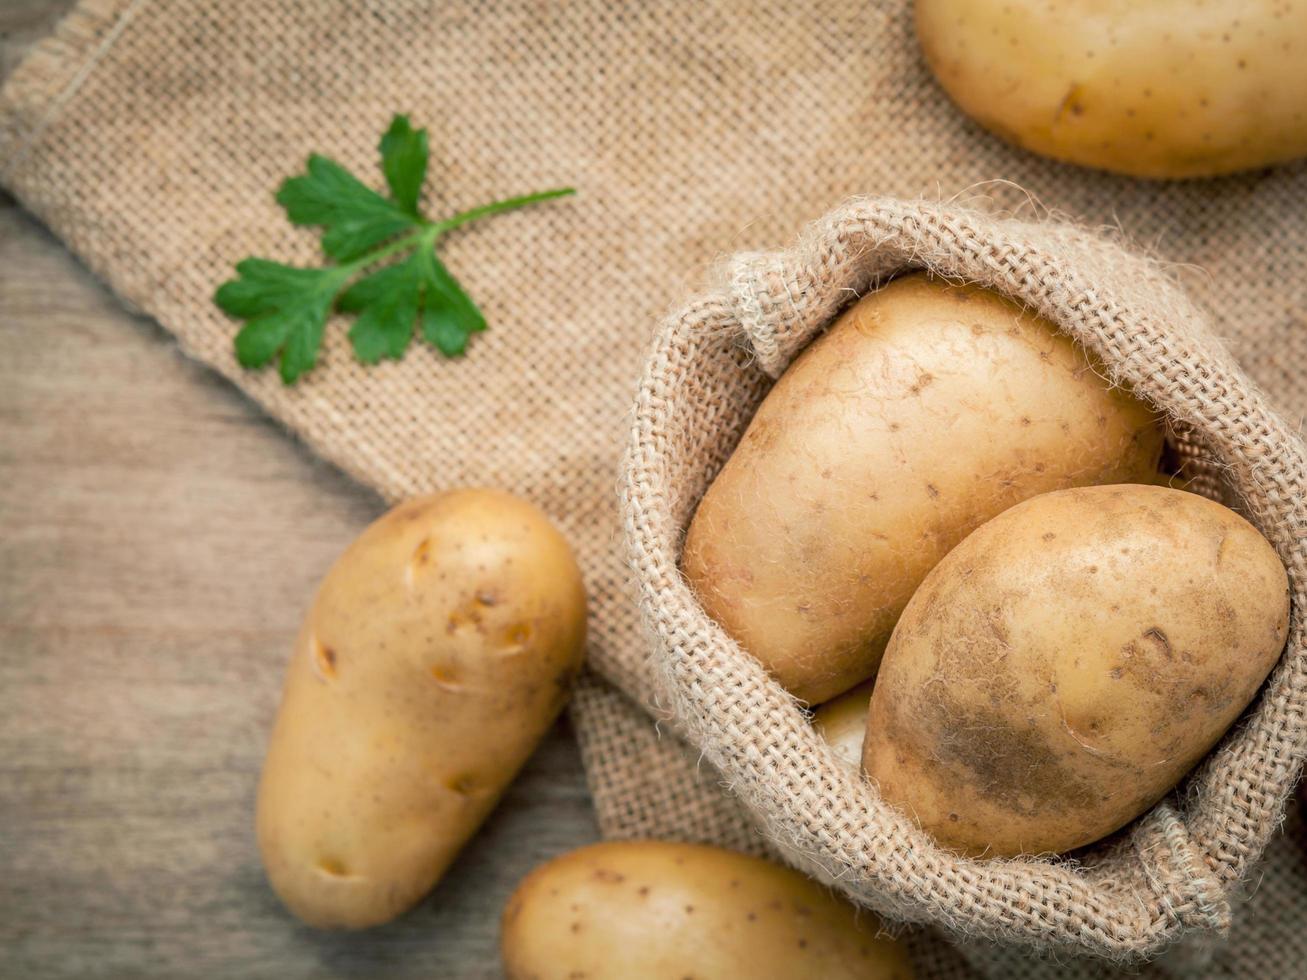 Fresh organic potatoes photo